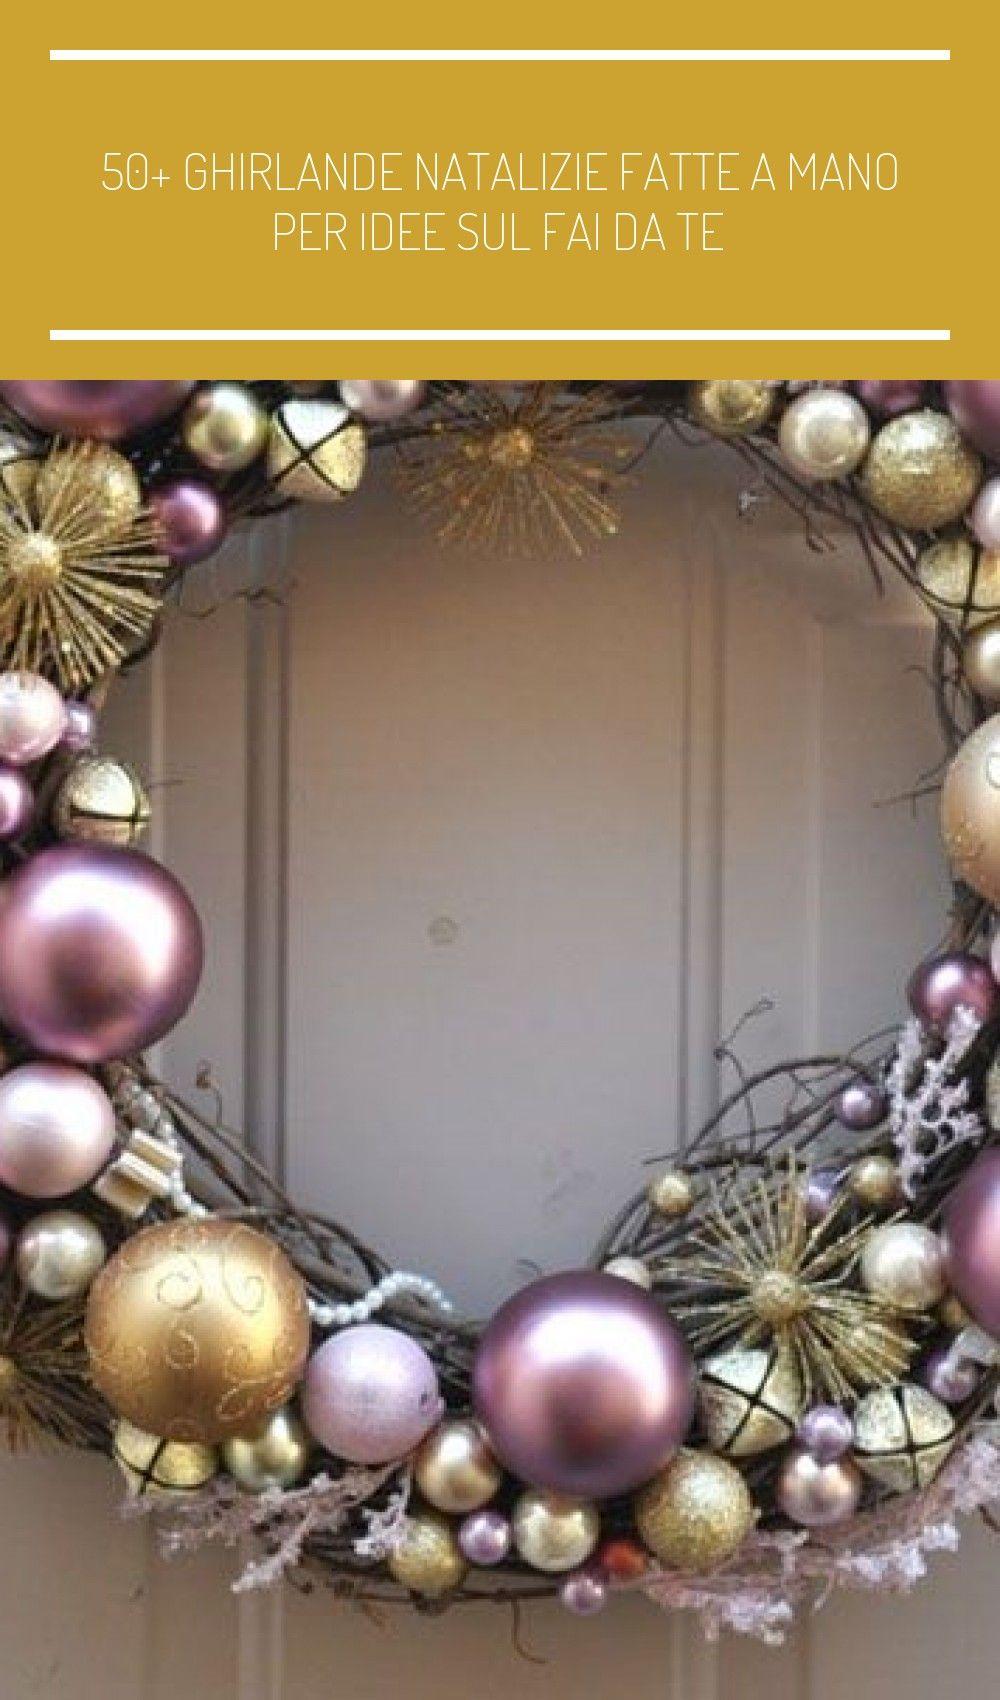 Photo of Diy Christmas Wreaths 16 # fai da te decorazioni natalizie ghirlande 50+ …